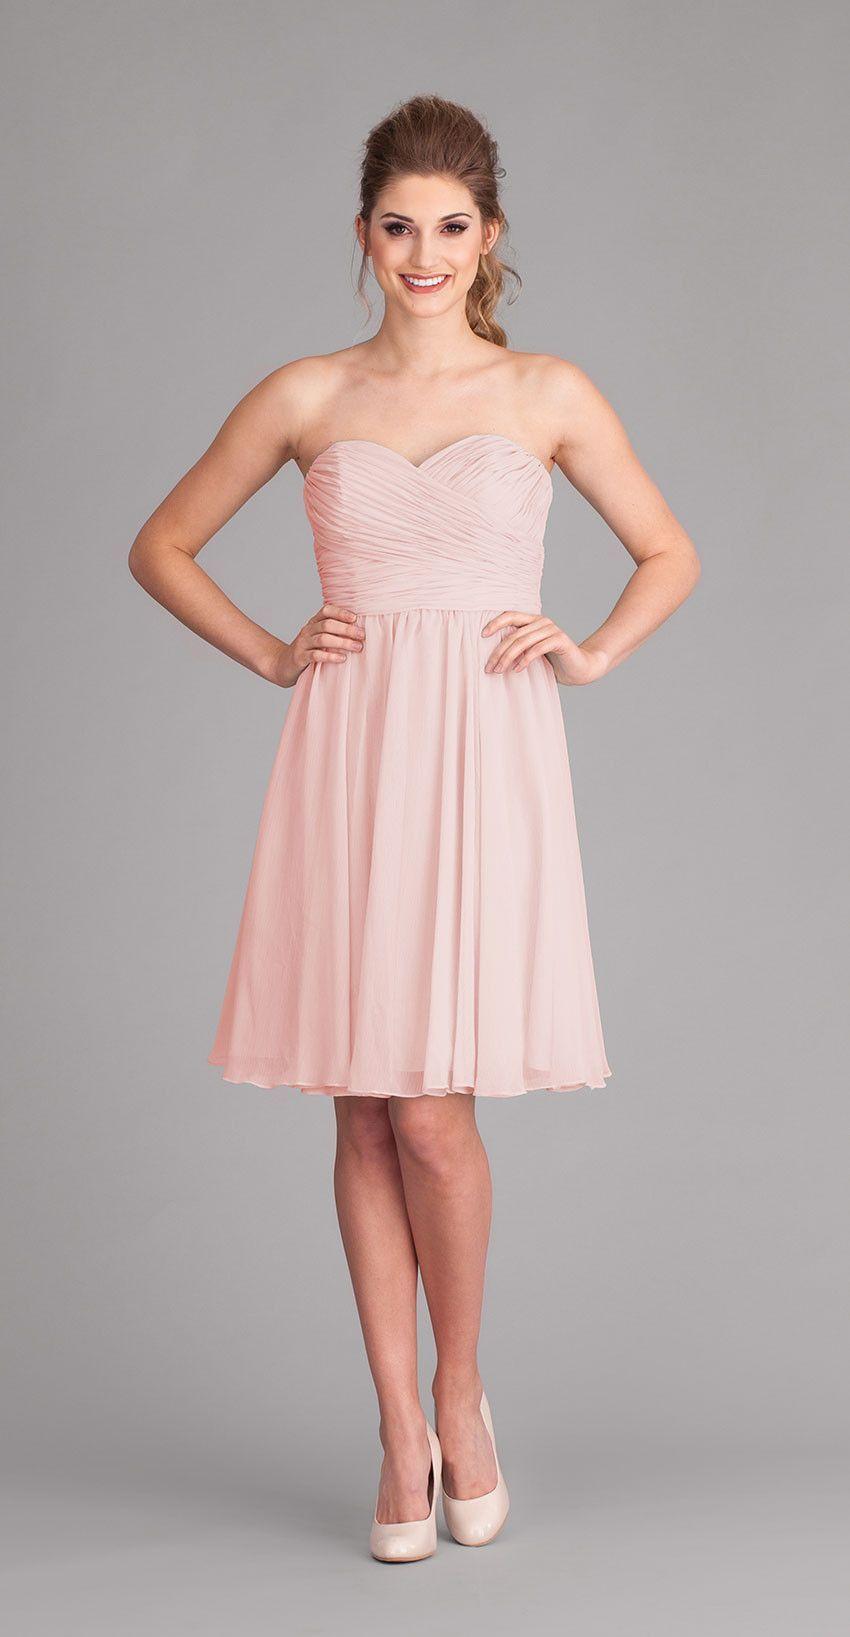 Vistoso Vestidos De Dama Parramatta Viñeta - Colección de Vestidos ...